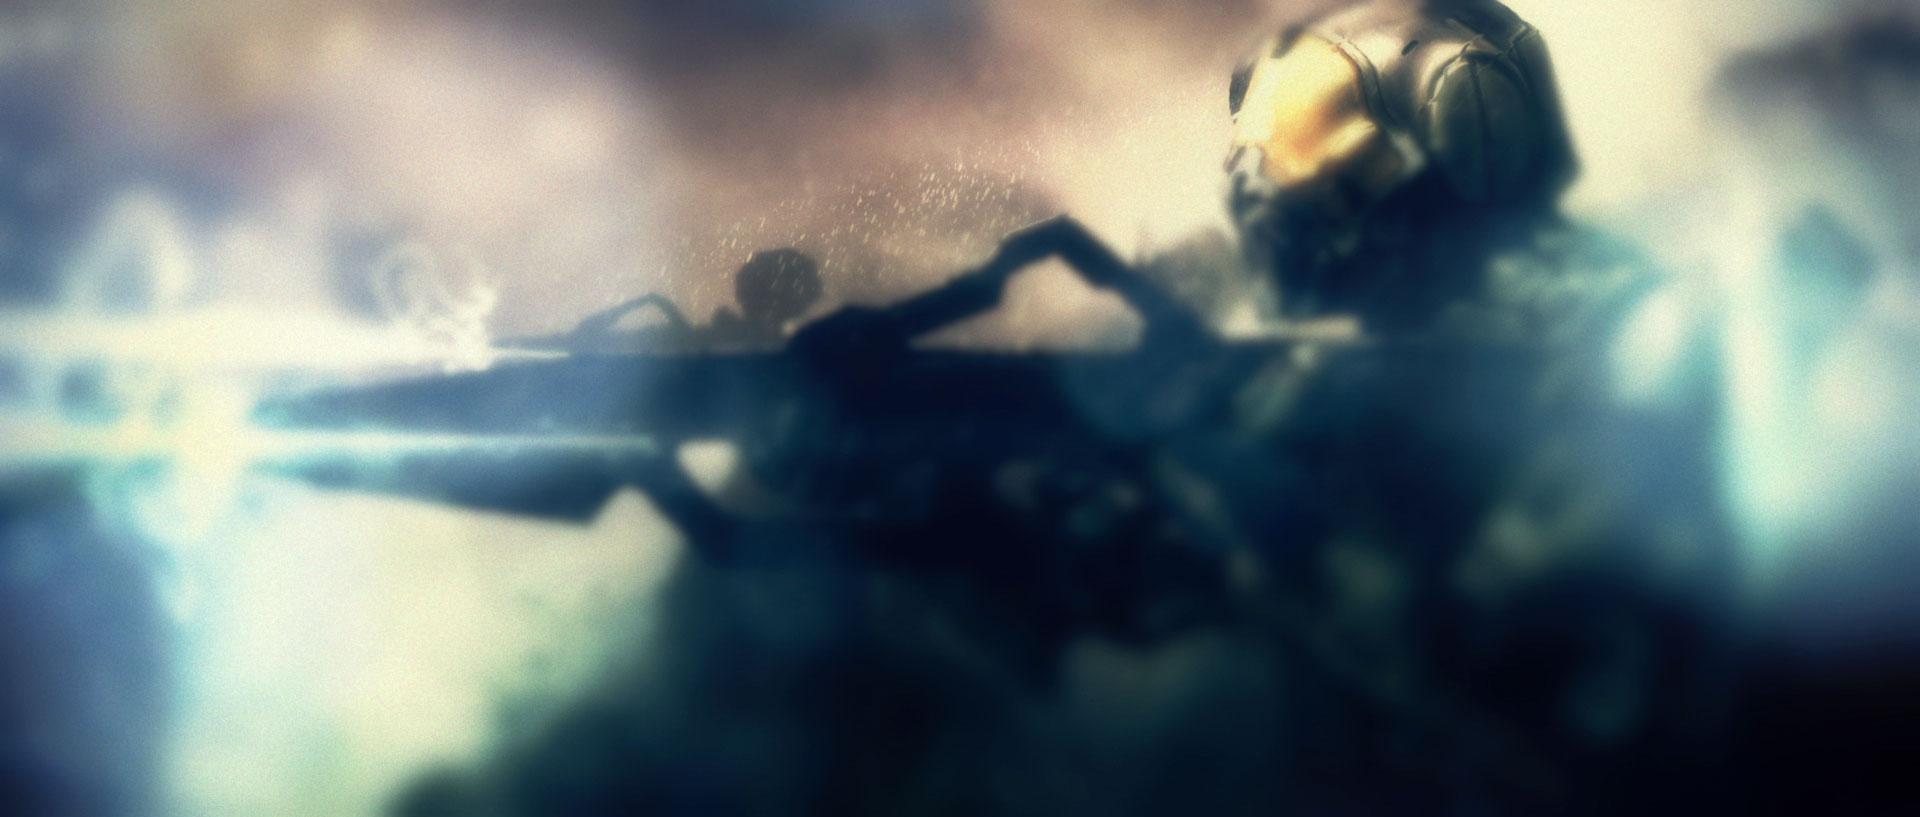 Halo4_2_Cropped_J60.jpg